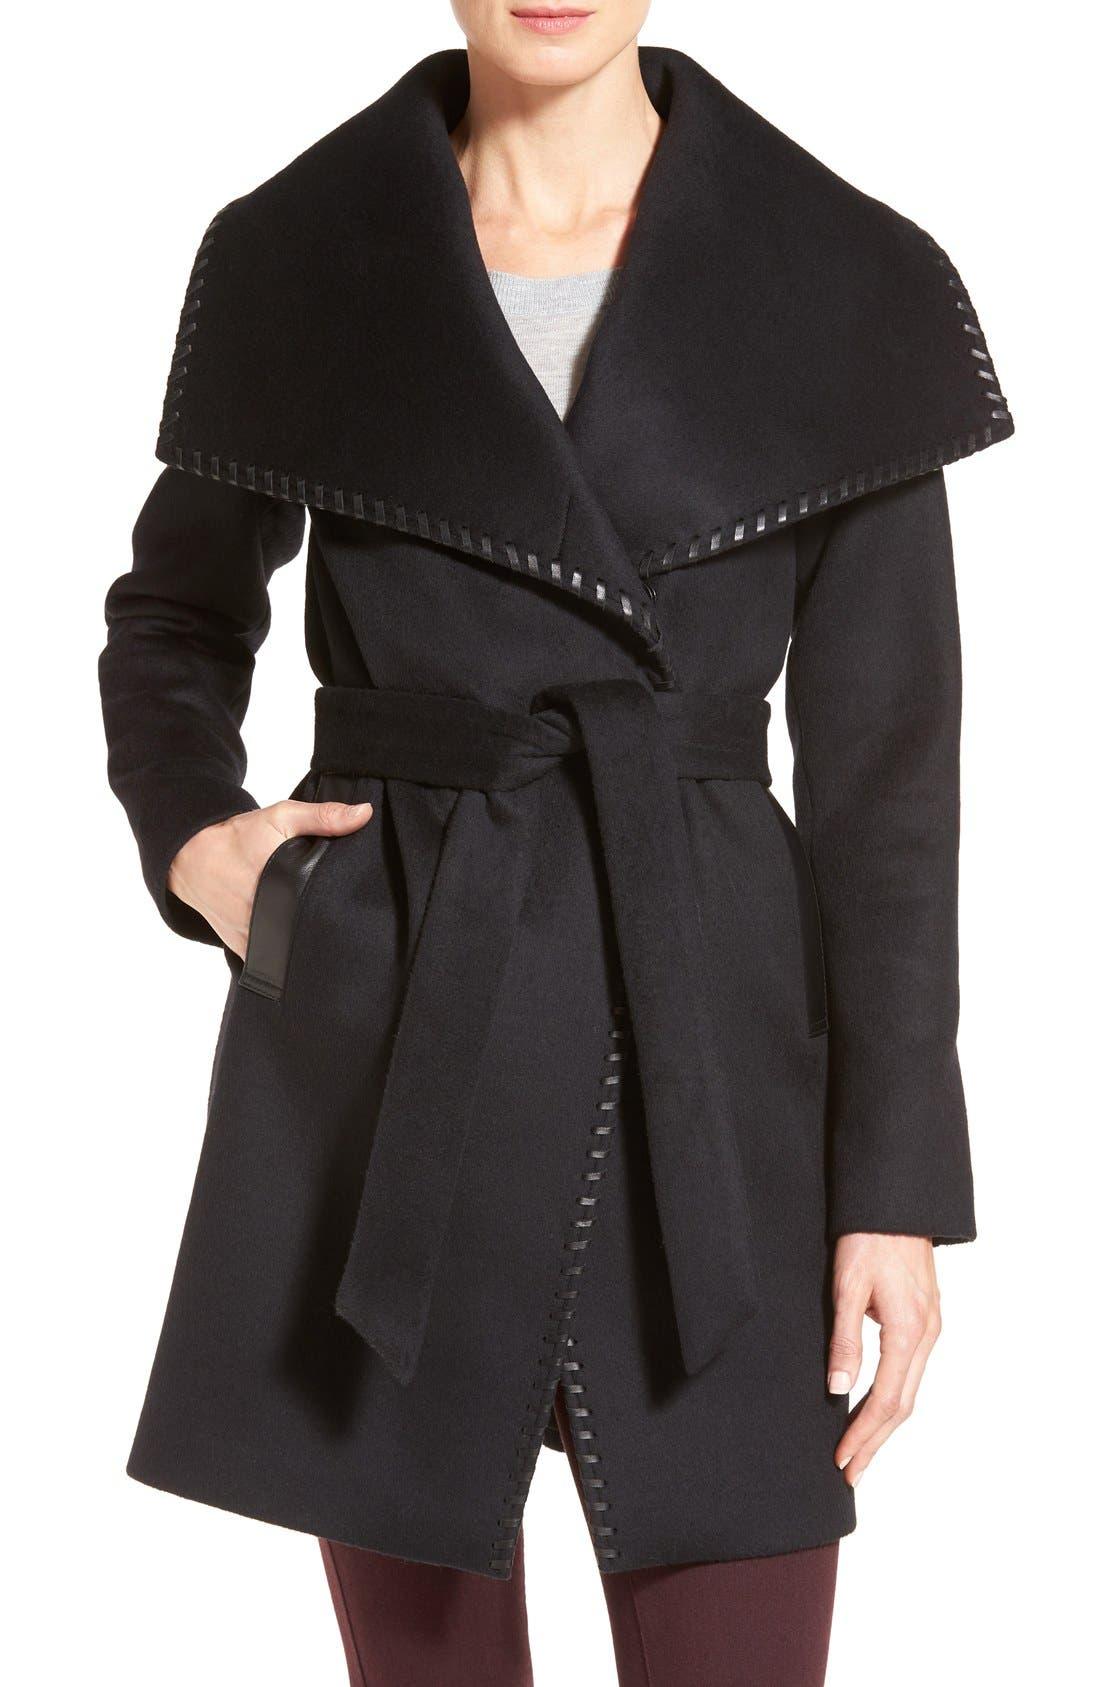 Alternate Image 1 Selected - Elie Tahari Whipstitch Wool Blend Wrap Coat